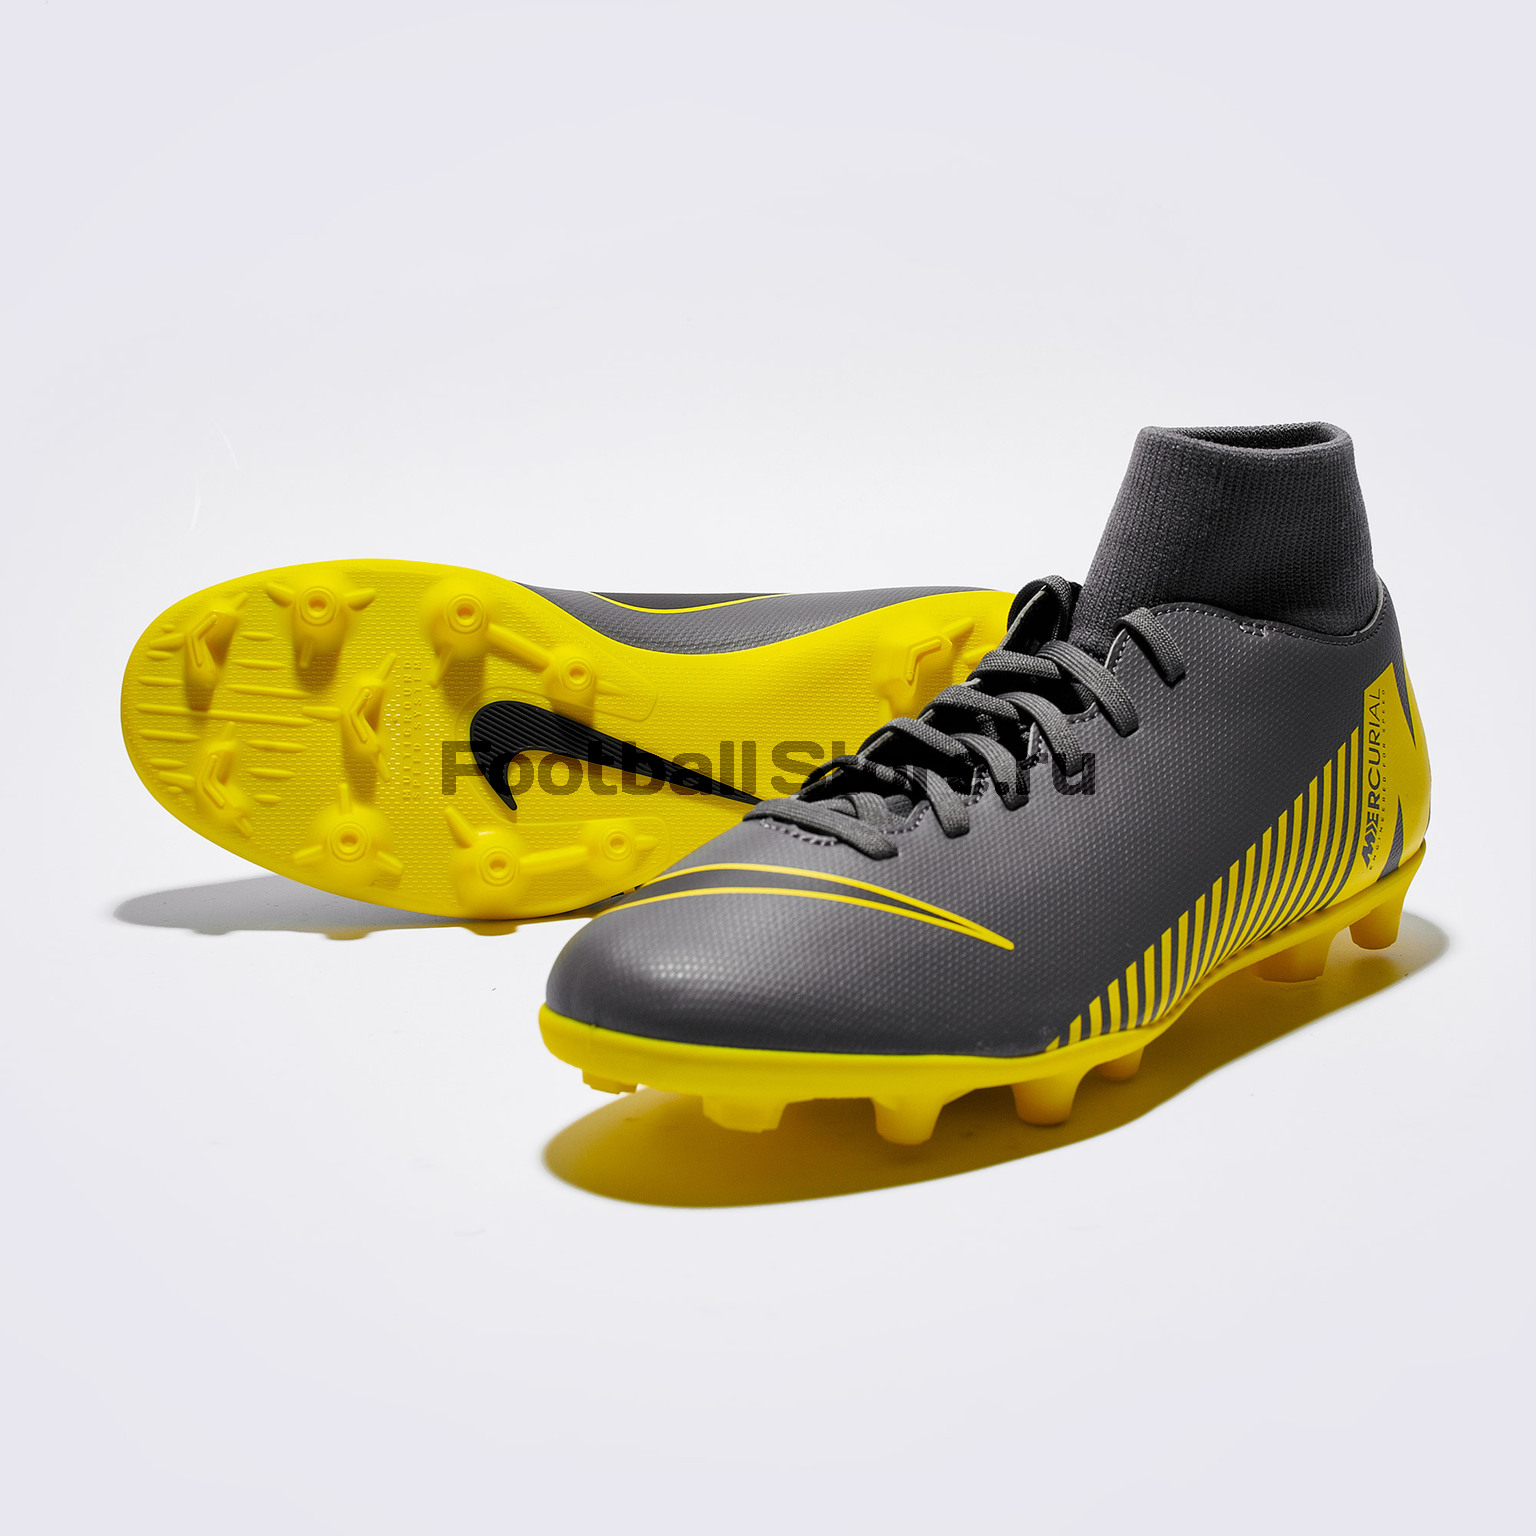 79654901511 Бутсы Nike SuperFly 6 Club FG MG AH7363-070 – купить бутсы в ...